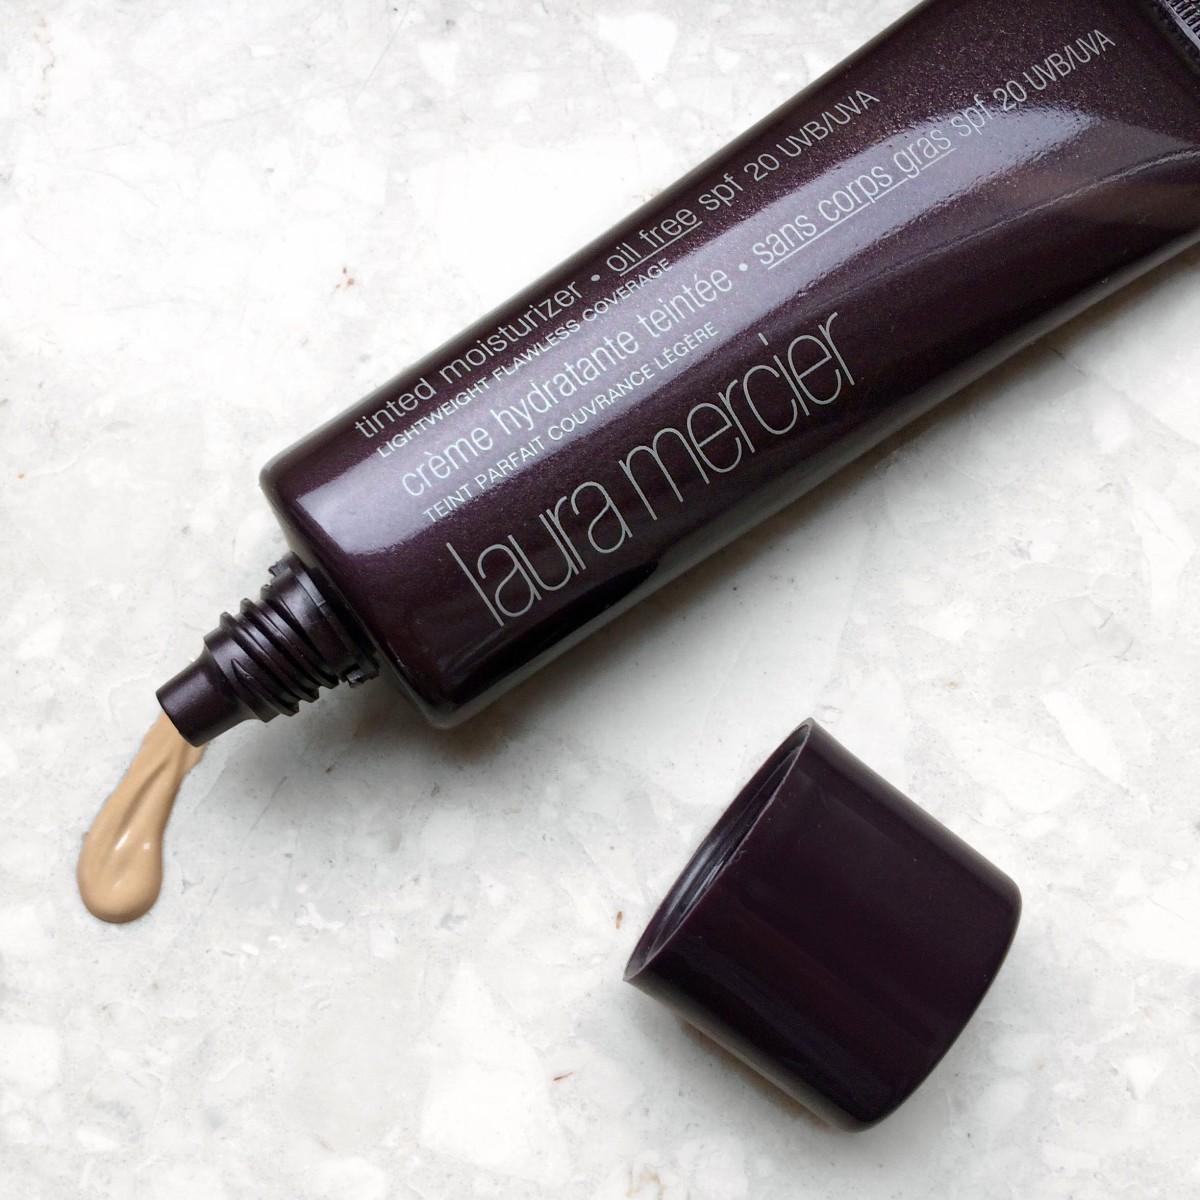 Laura Mercier tinted moisturizer - worth the price?